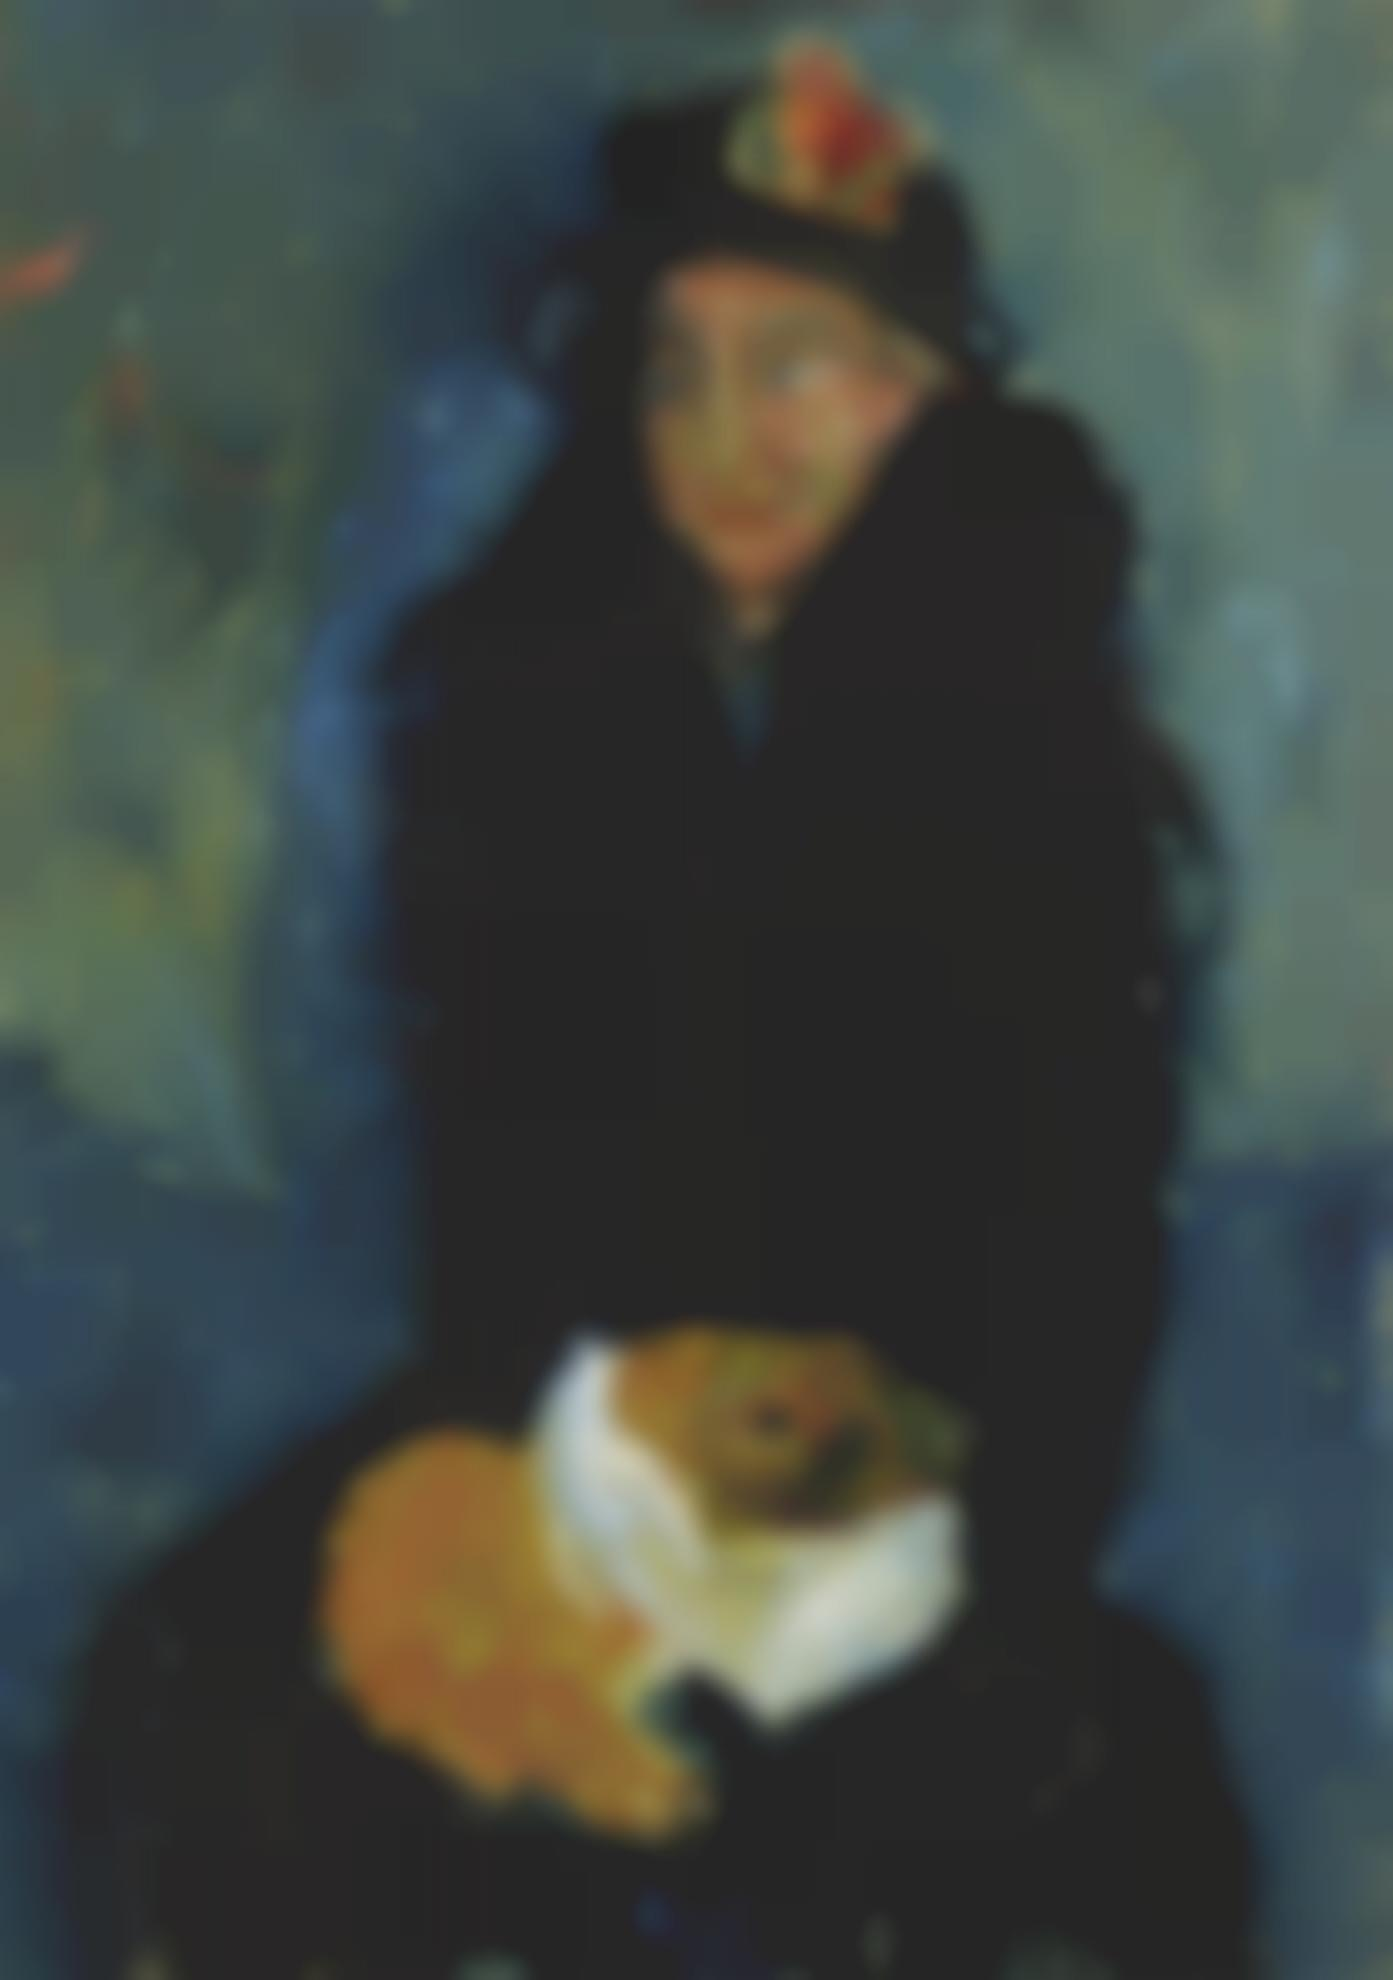 Chaim Soutine-La Vieille Dame Au Chien-1919